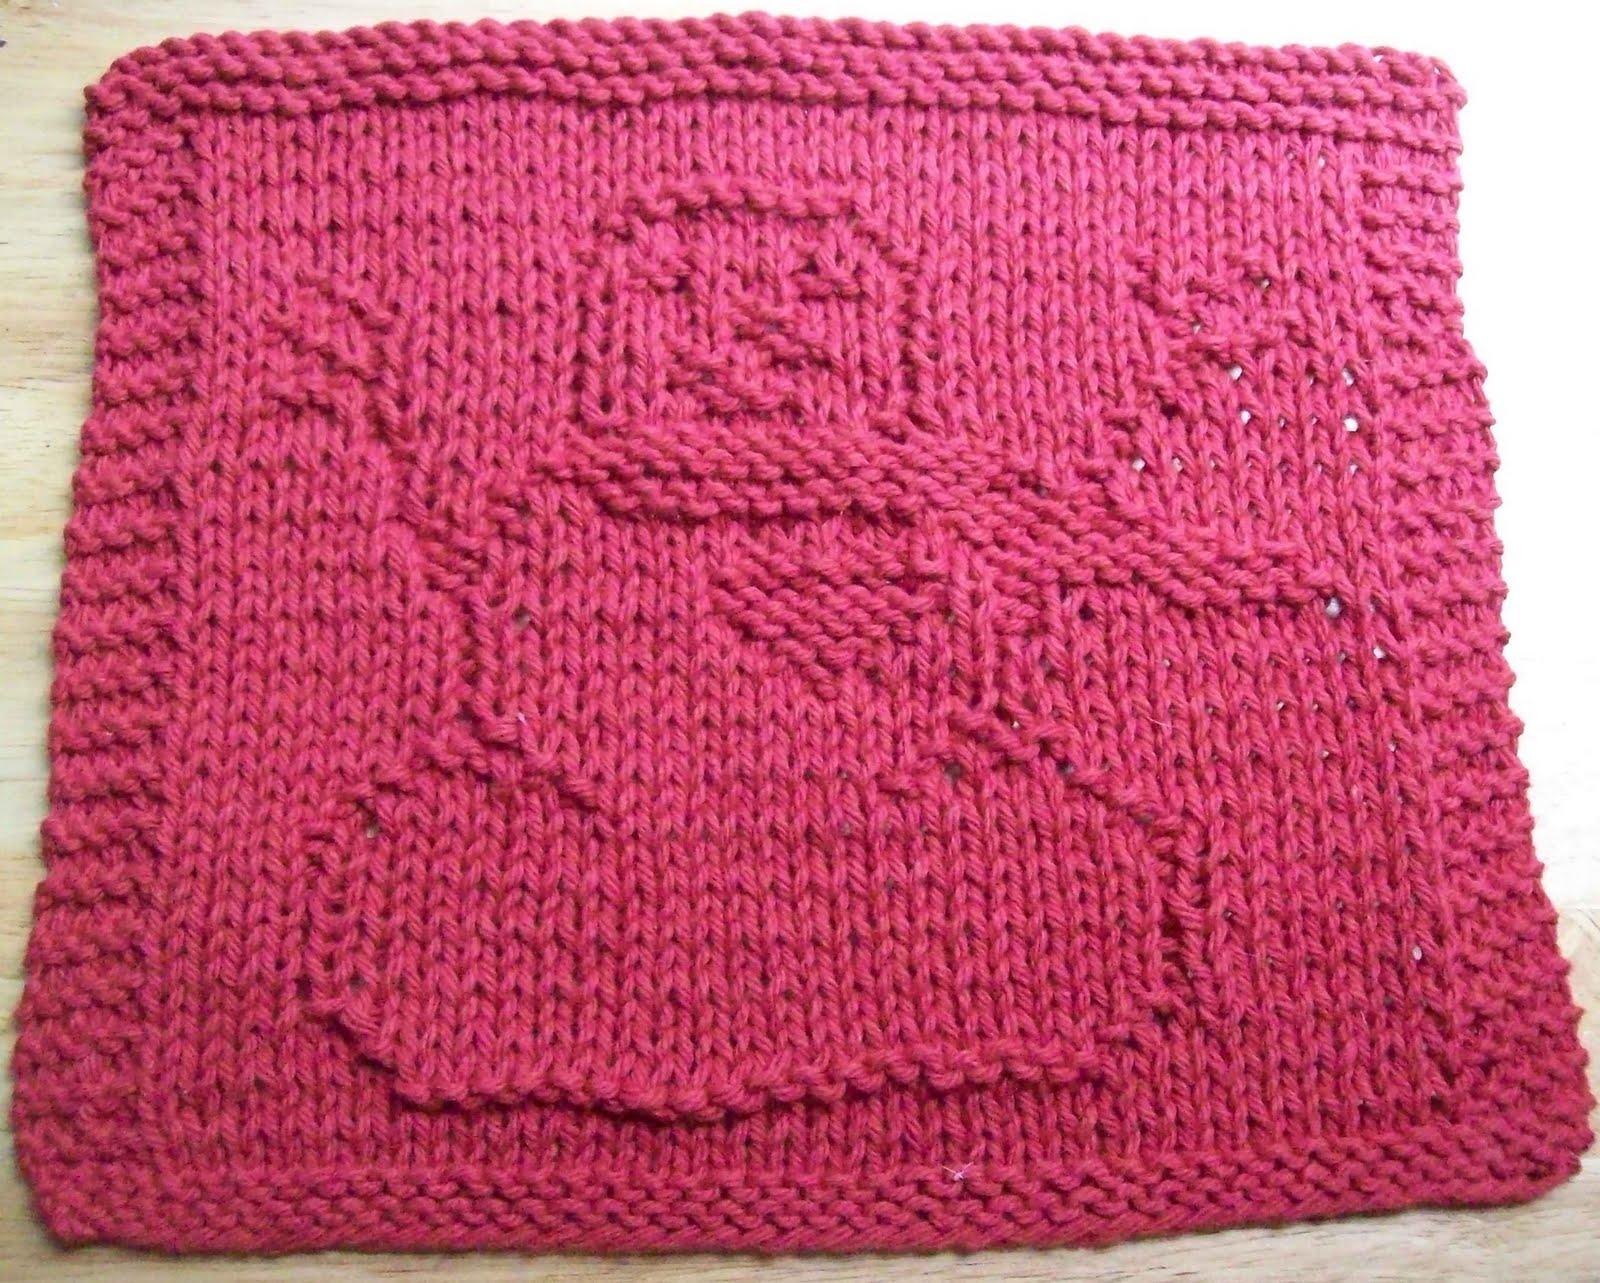 Knitting Pattern Heart Dishcloth : knitting snowman knit dishcloth pattern car interior design Book Covers